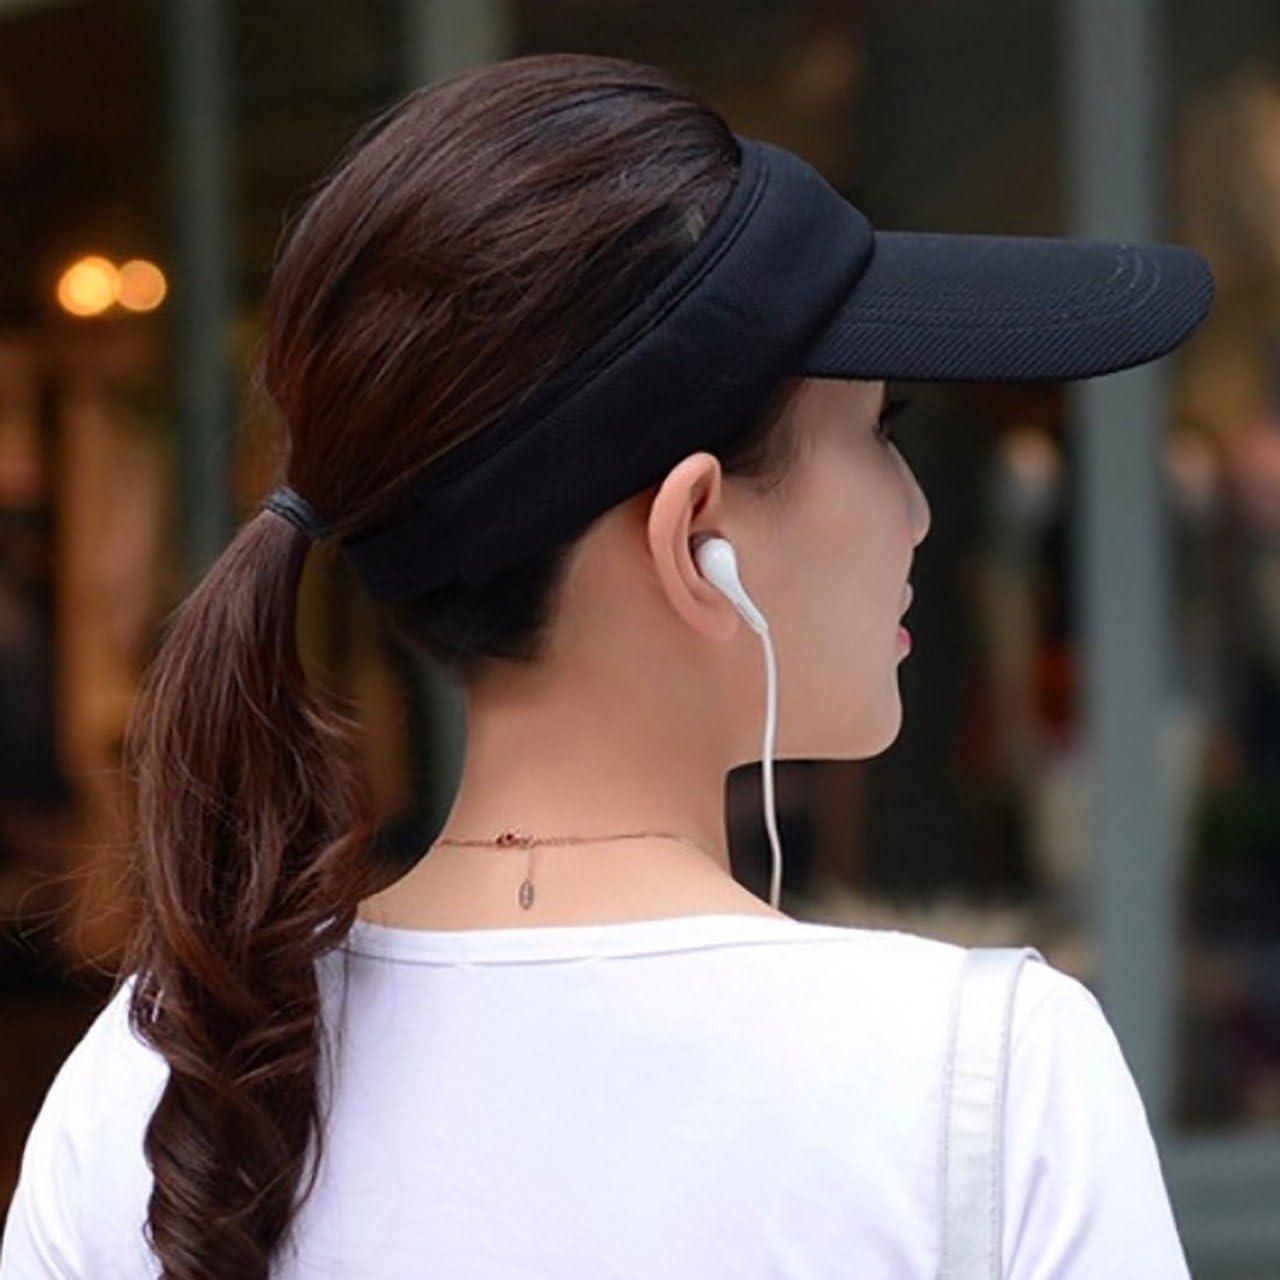 ONE LIMITATION(ワン リミテーション) バイザー サンバイザー 帽子 つば広 紫外線 UVカット スポーツ レディース CP029 (01 ブラック)